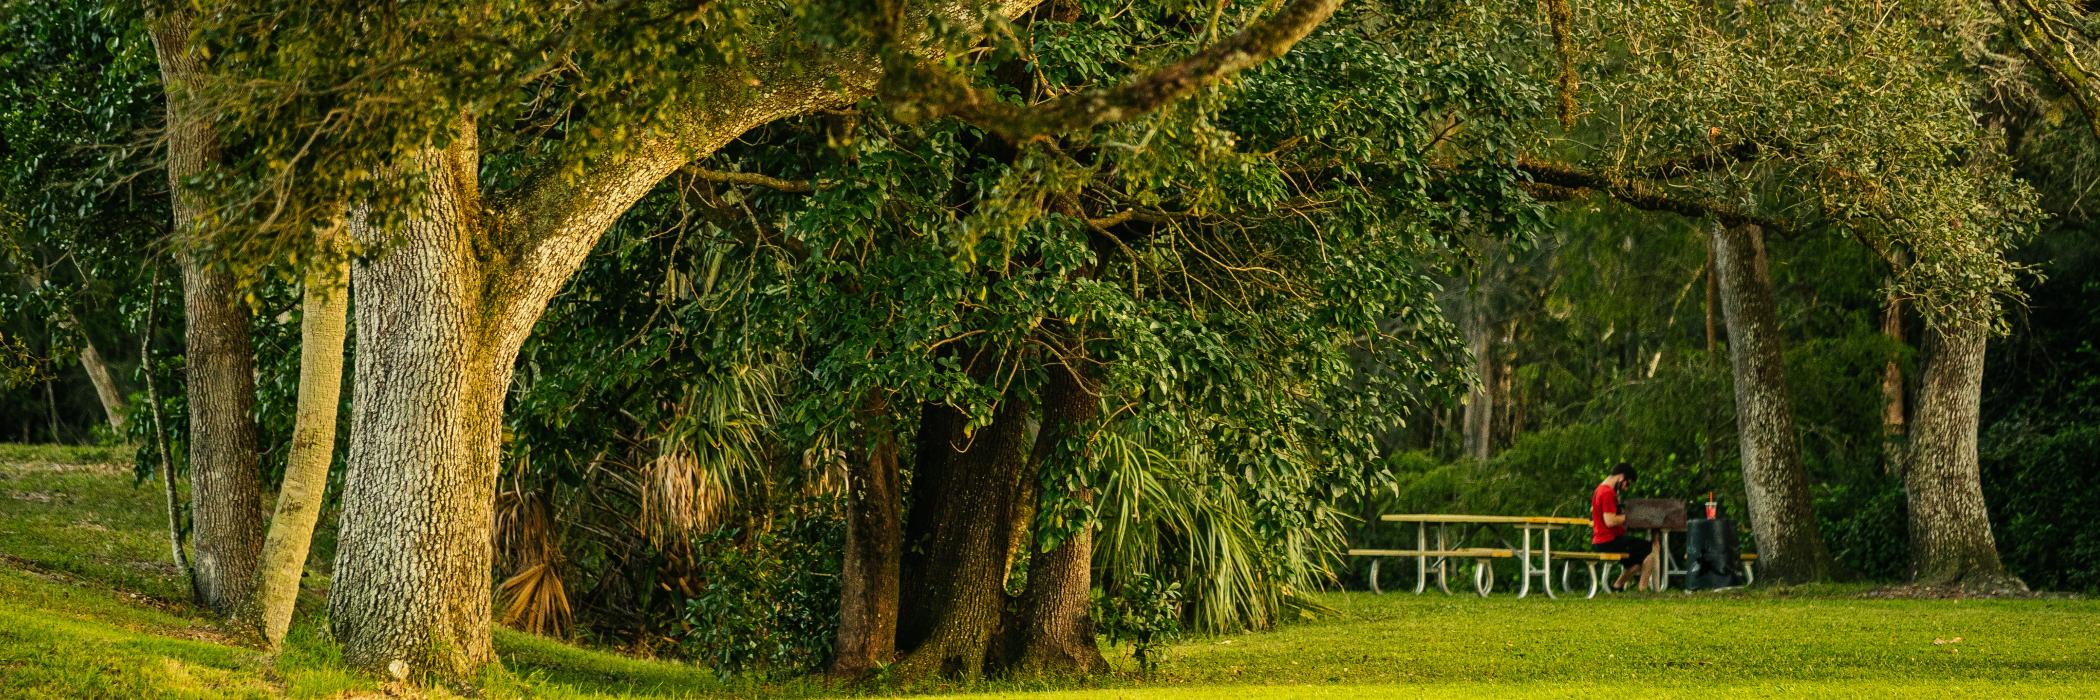 Tree Tops Park